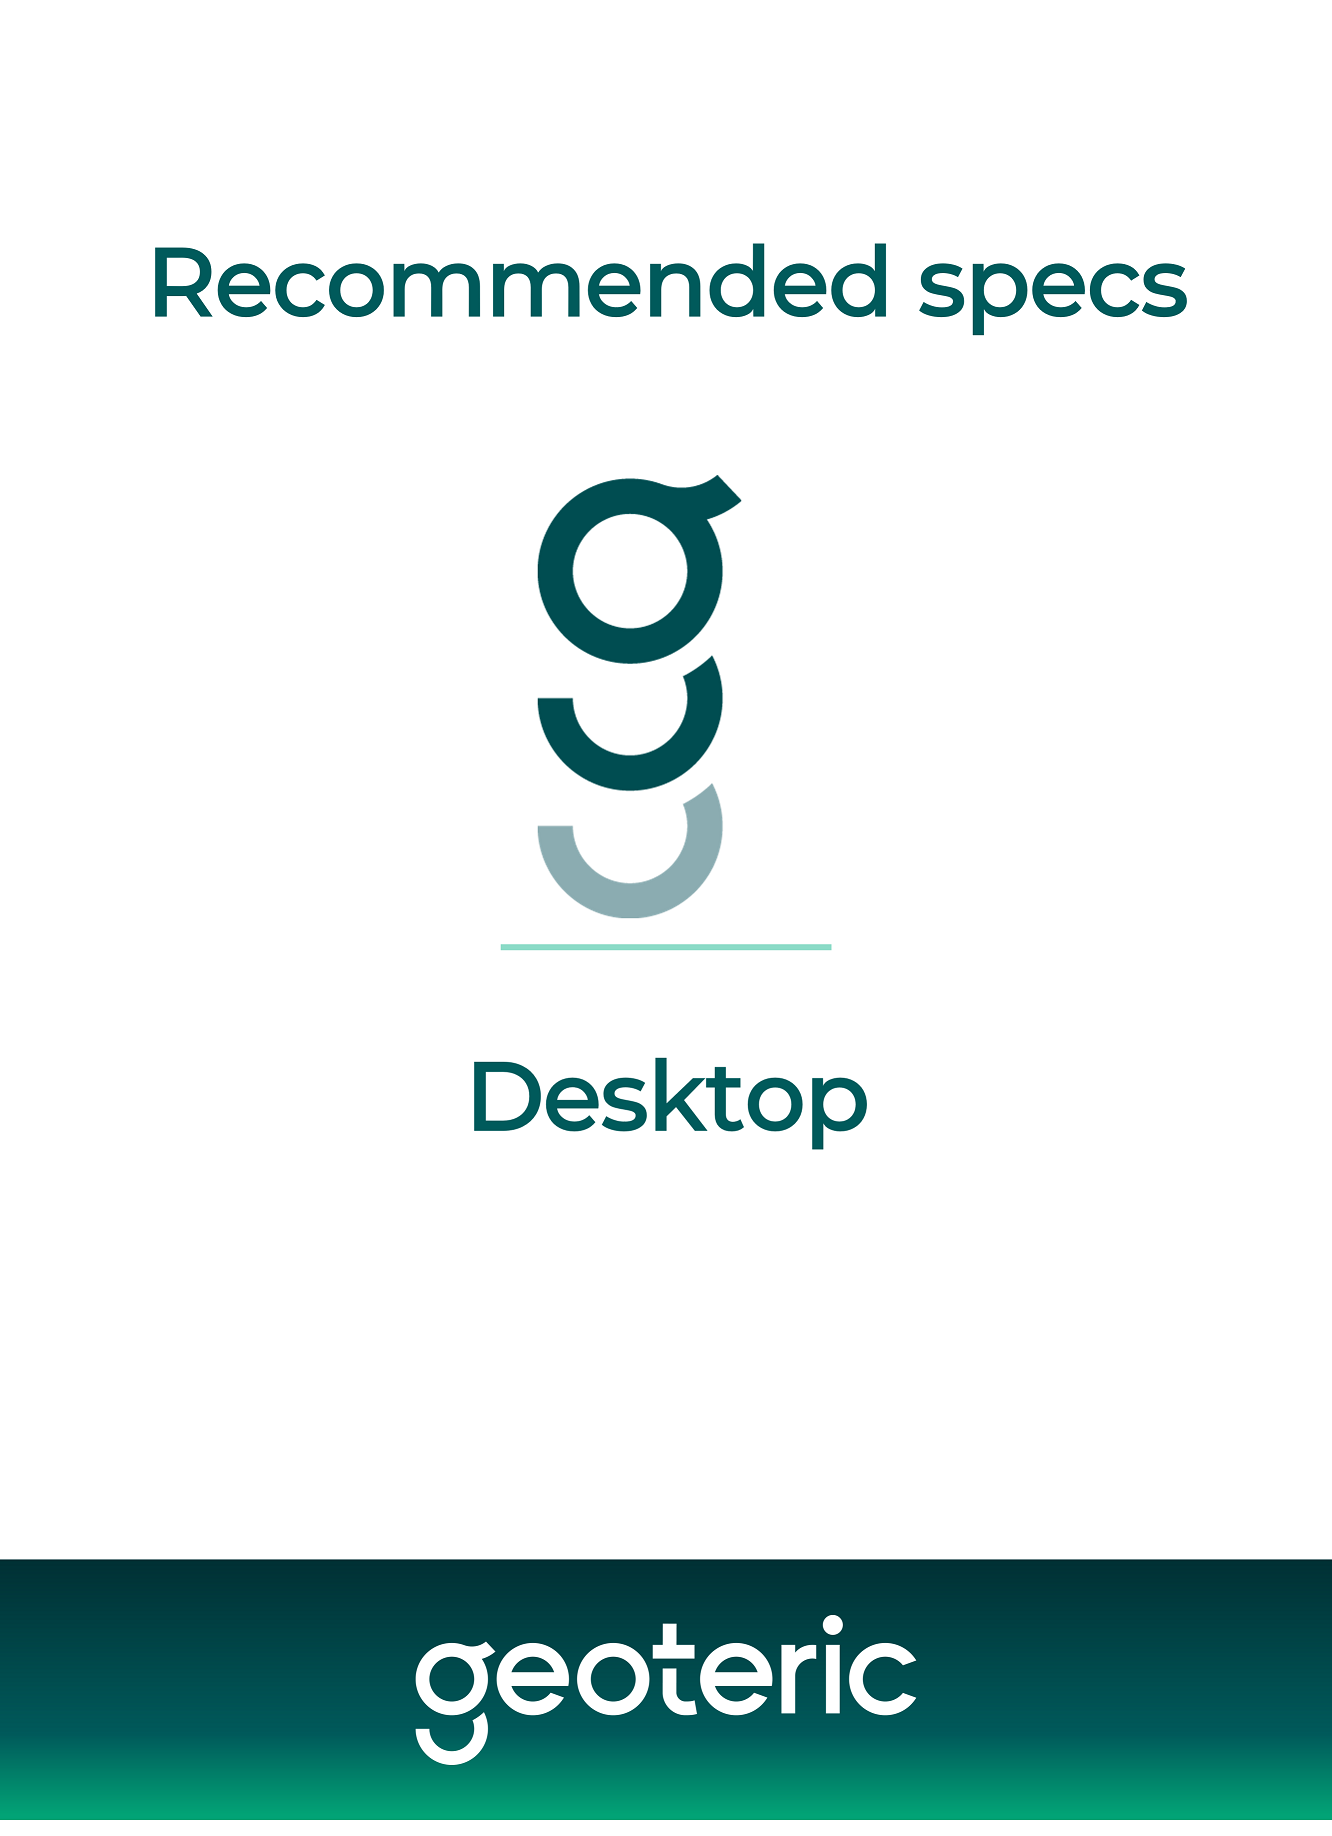 Recommended specs – desktop